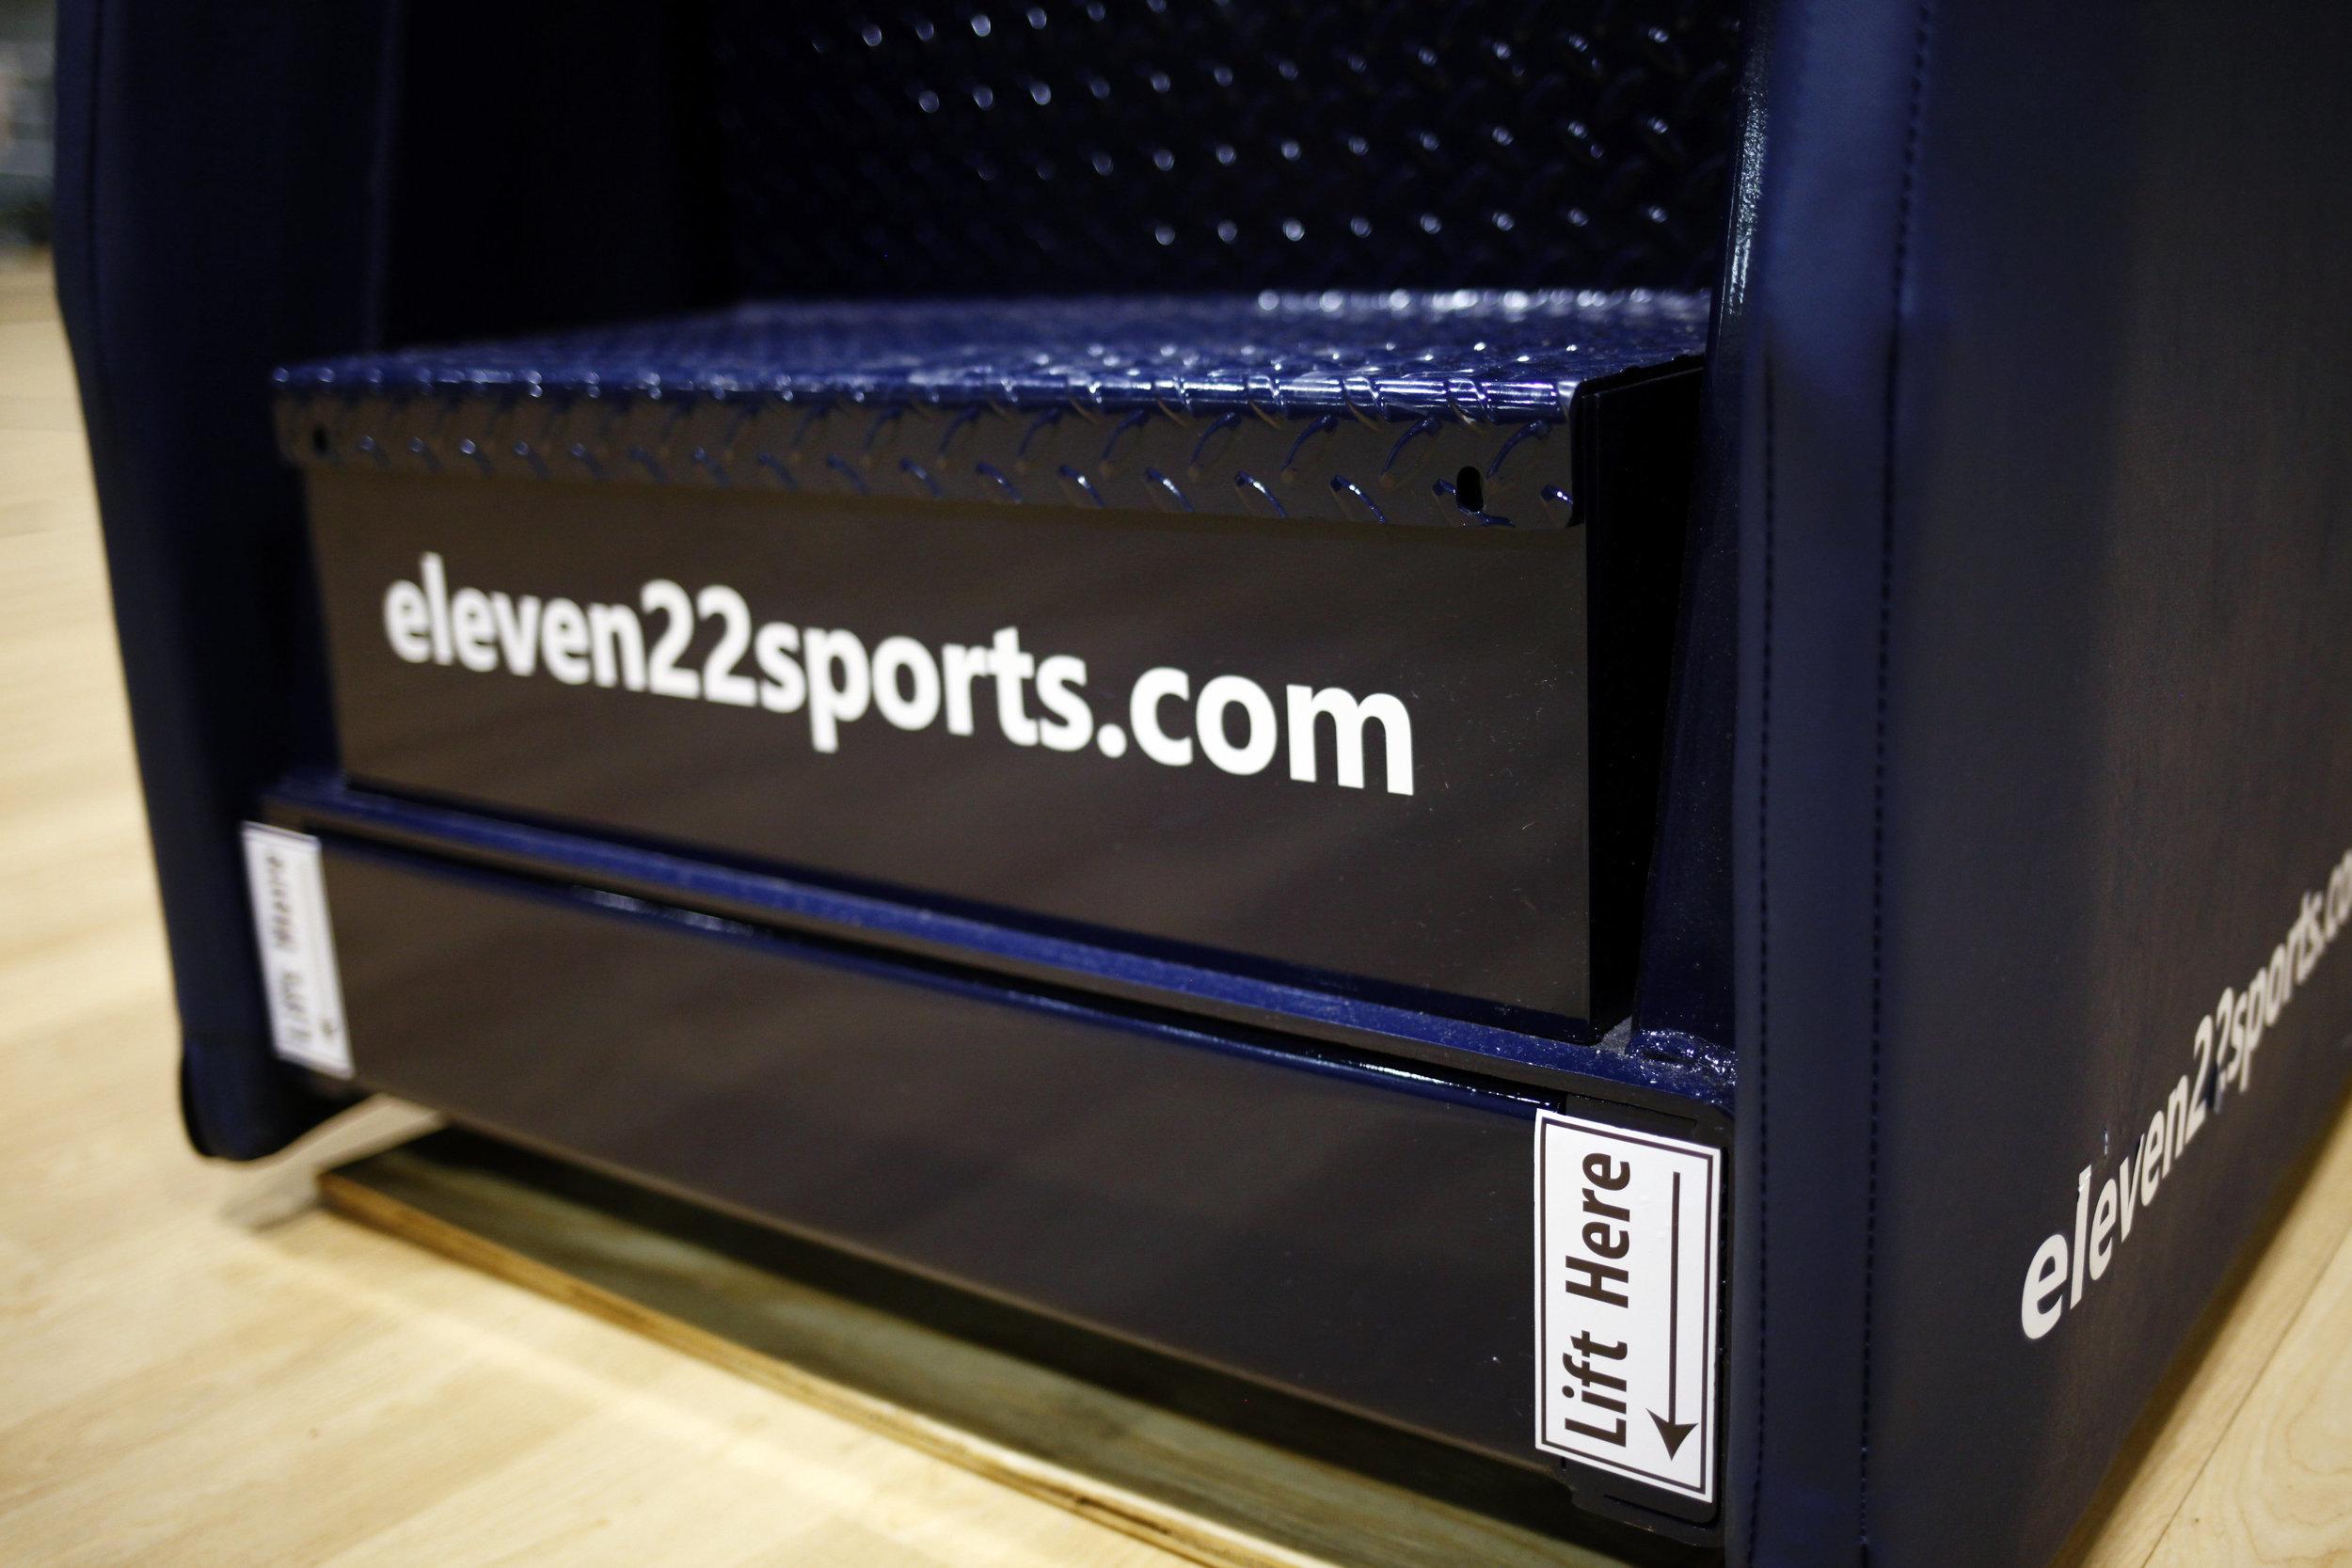 Eleven22-Eleven22-0003.jpg